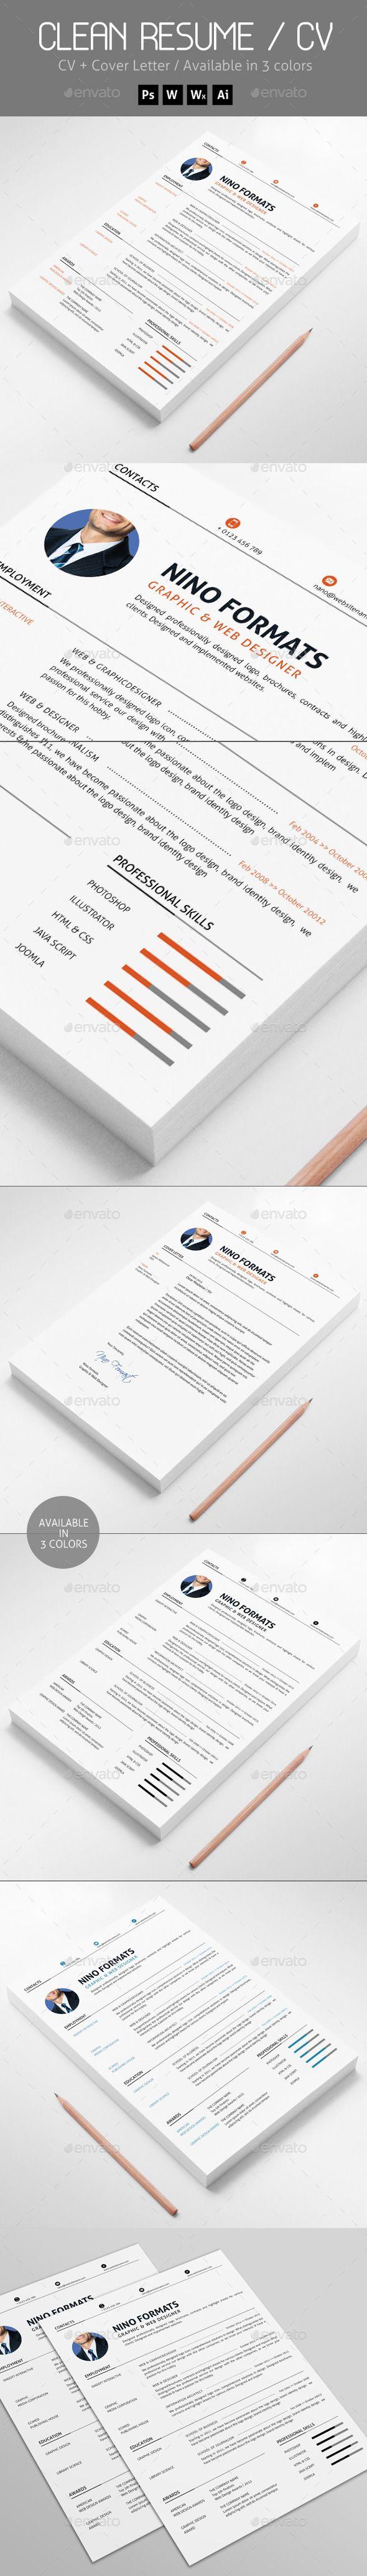 24 best Resume/CV Inspiration images on Pinterest | Design resume ...